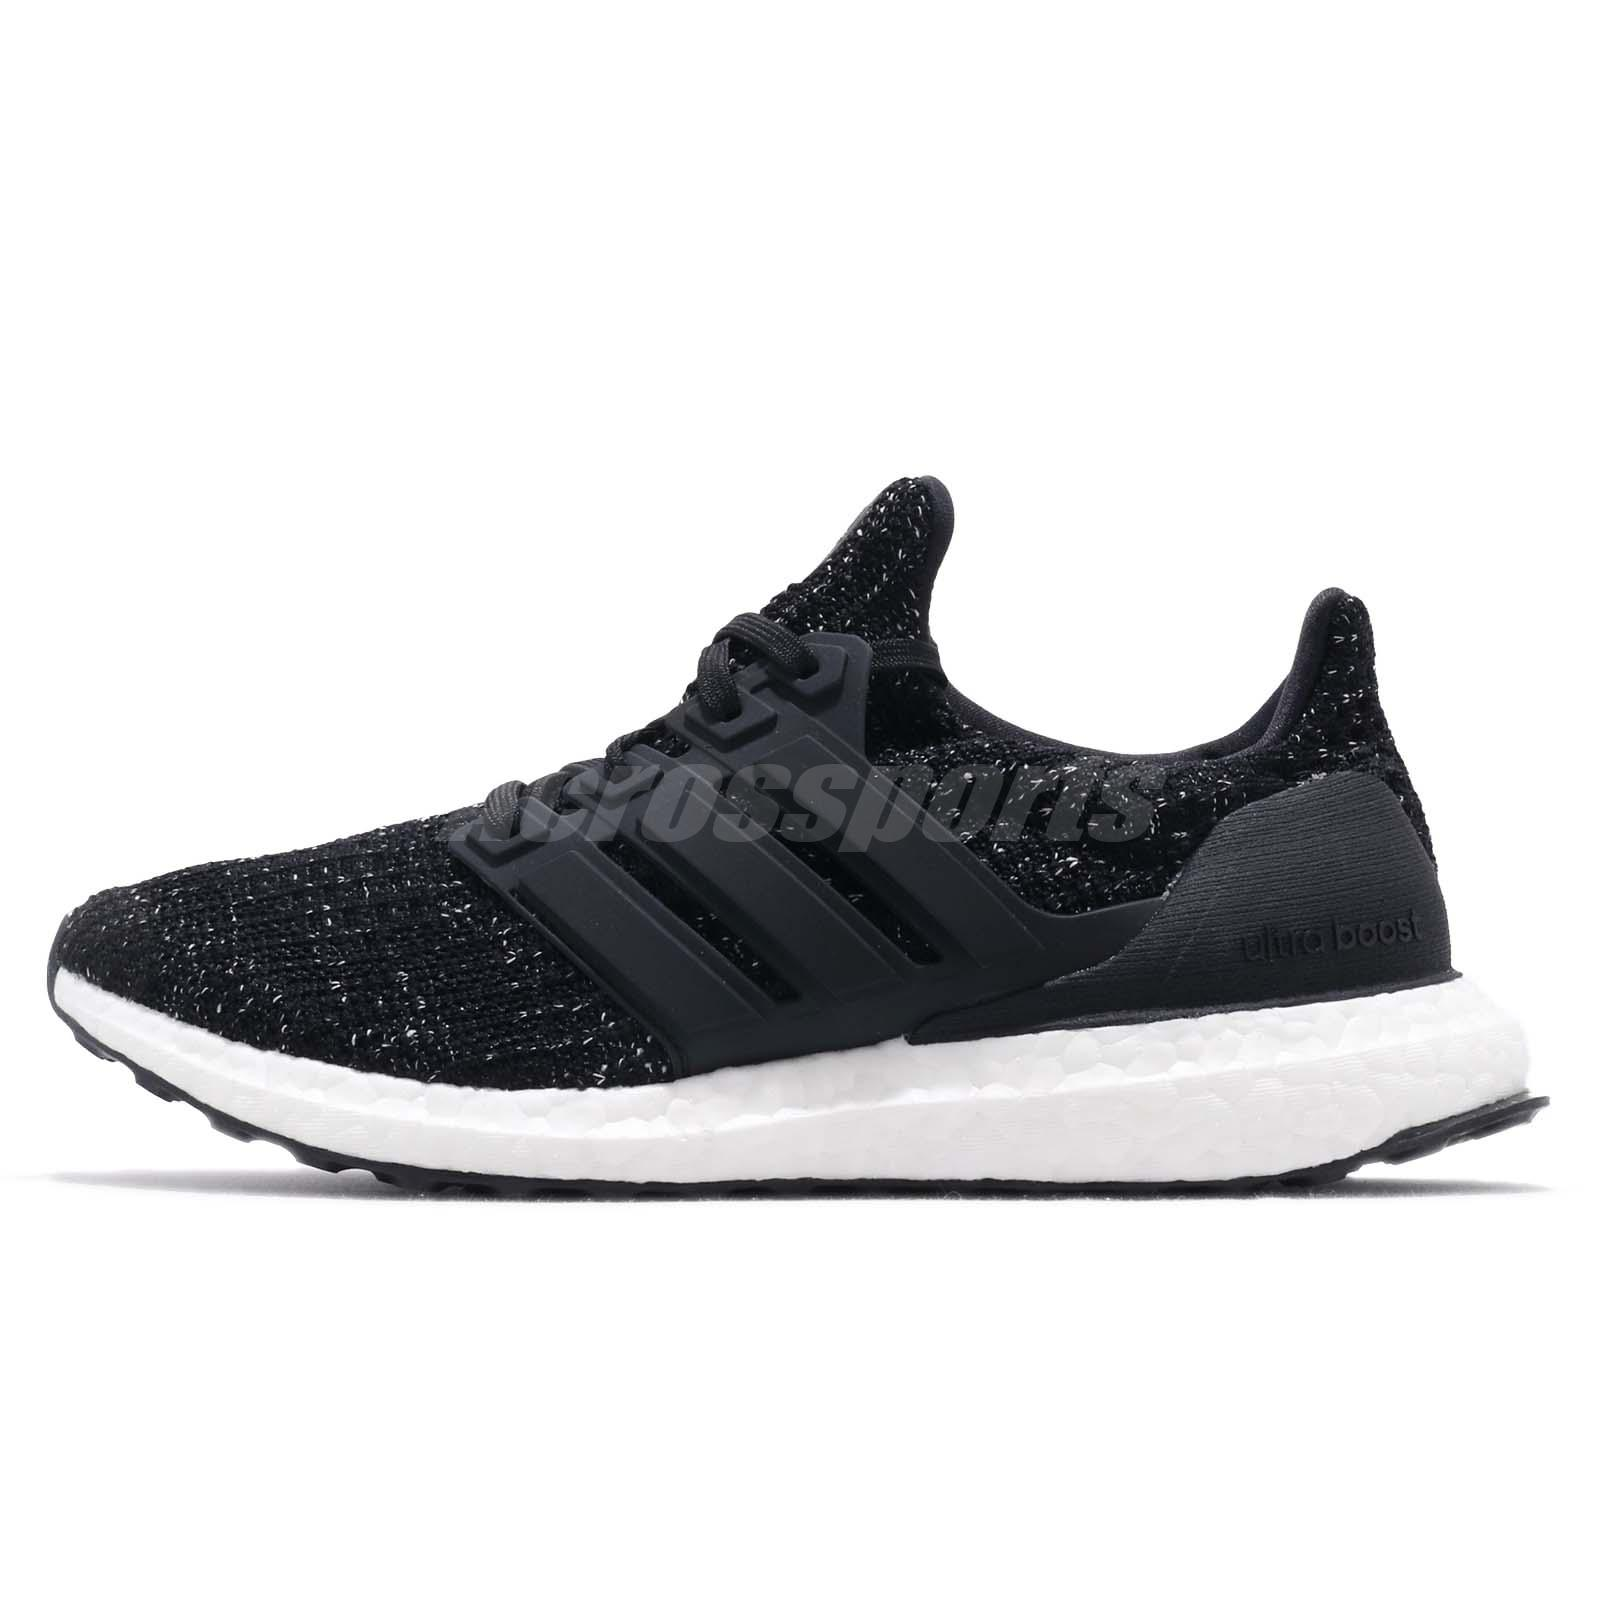 6681b15d89f07 adidas UltraBOOST W 4.0 Black White Women Running Training Shoes Sneakers  F36125